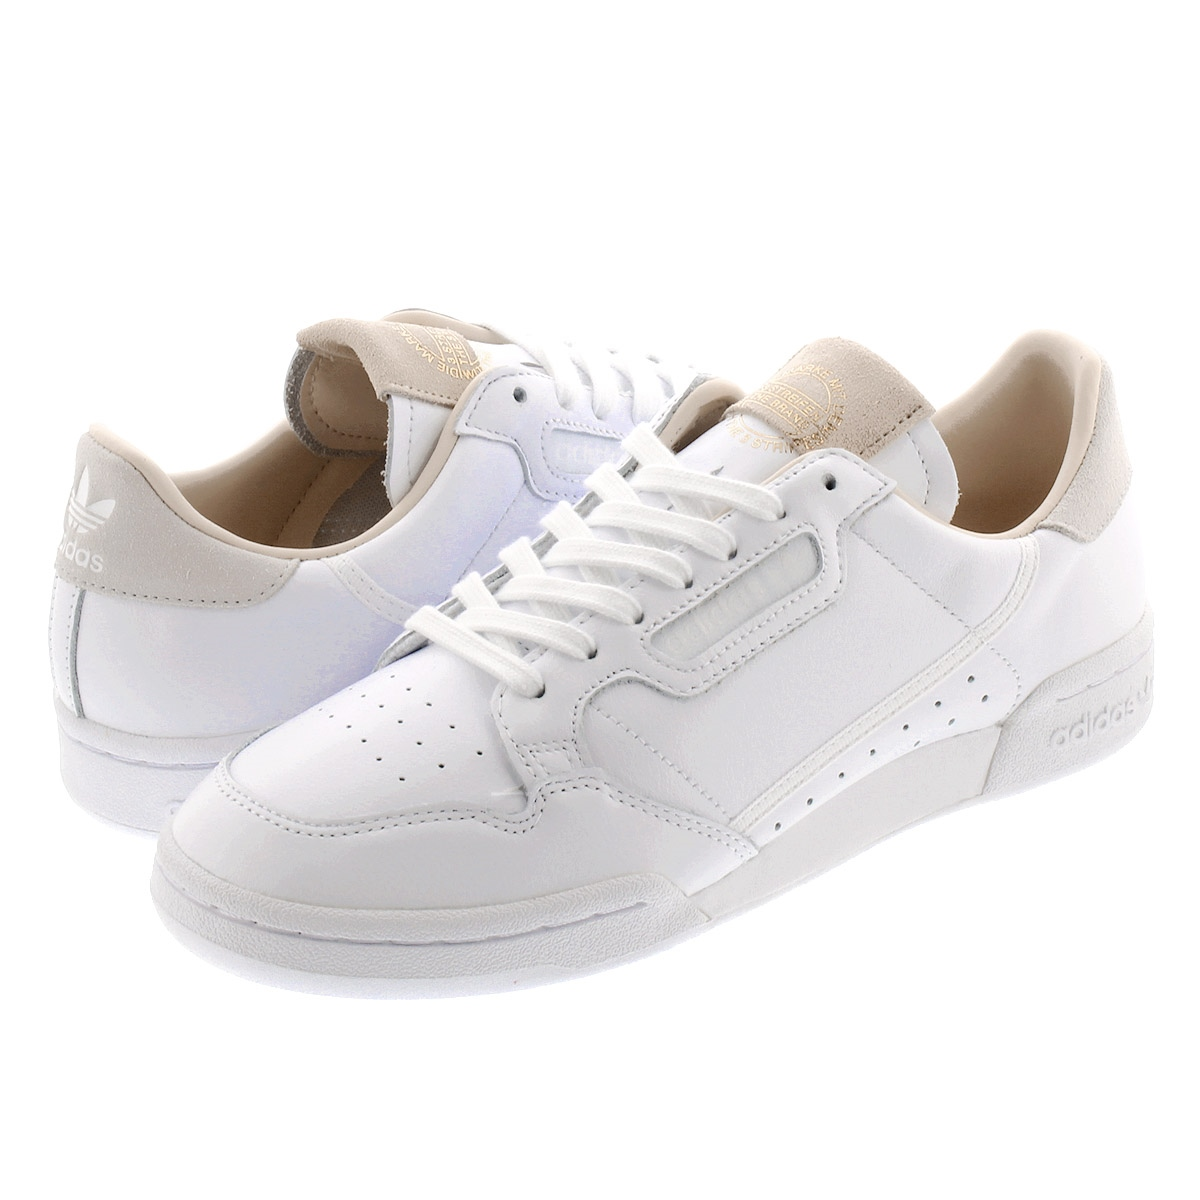 adidas CONTINENTAL 80 Adidas Continental 80 RUNNING WHITE/RUNNING  WHITE/CRYSTAL WHITE ef2101